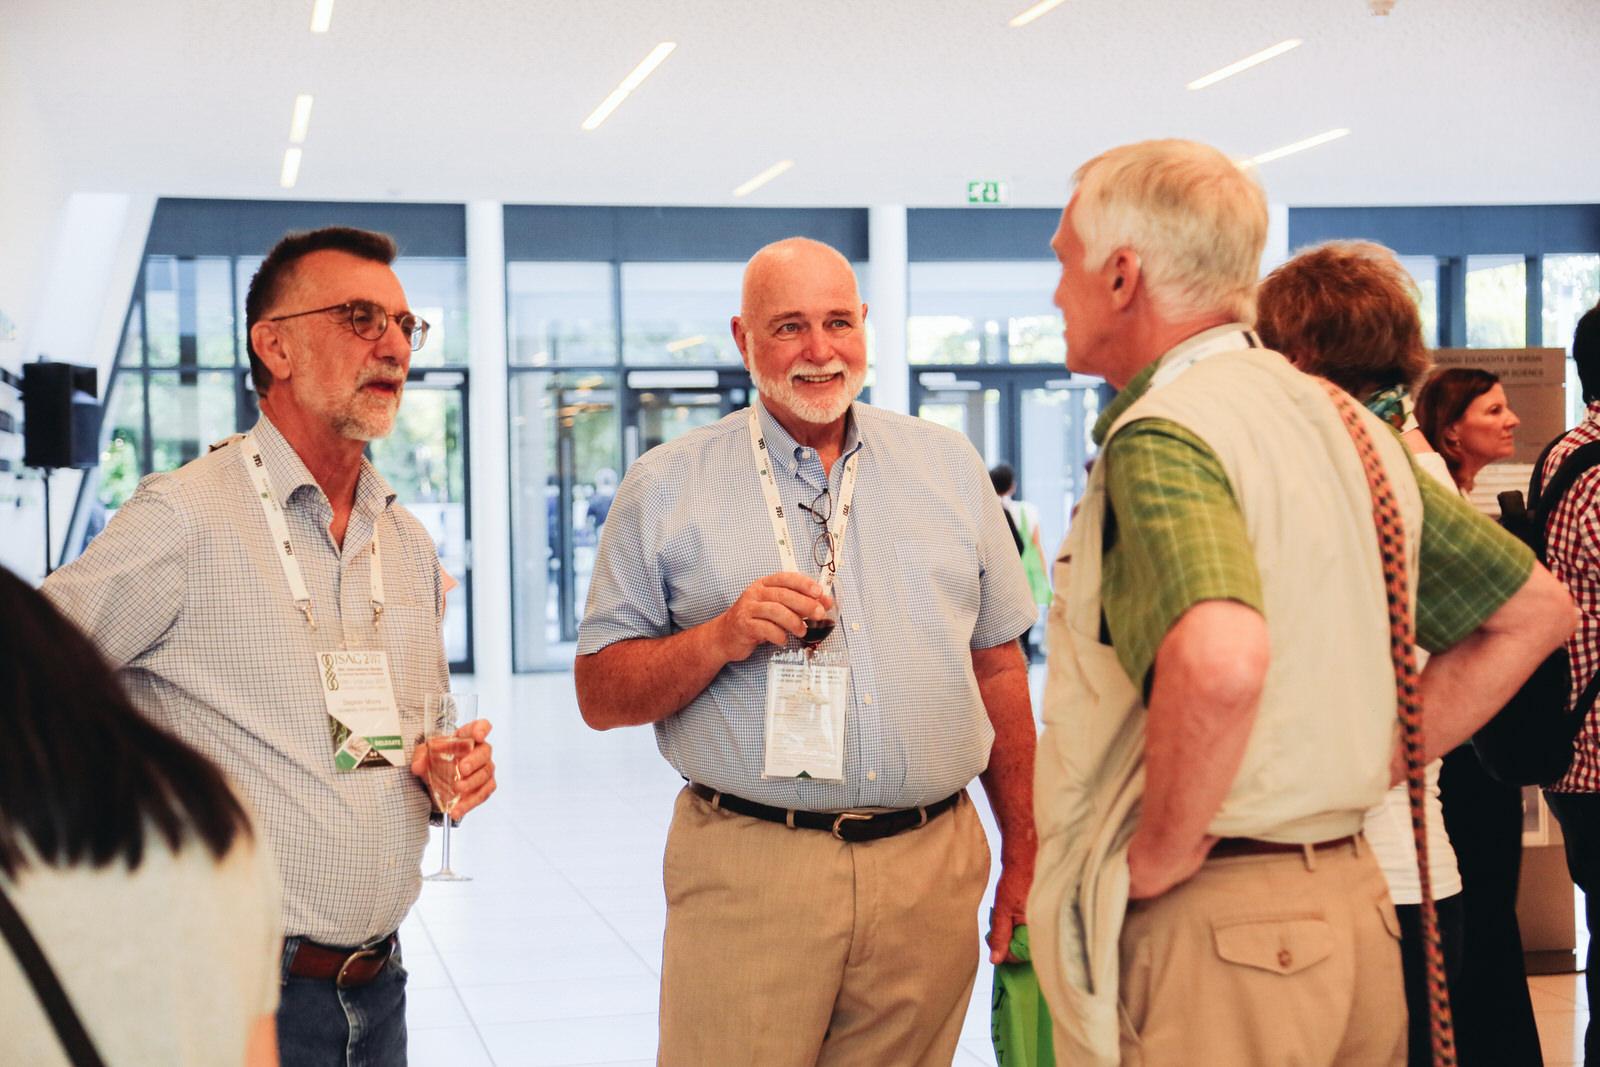 Corporate-conference-photographer-dublin-064.jpg